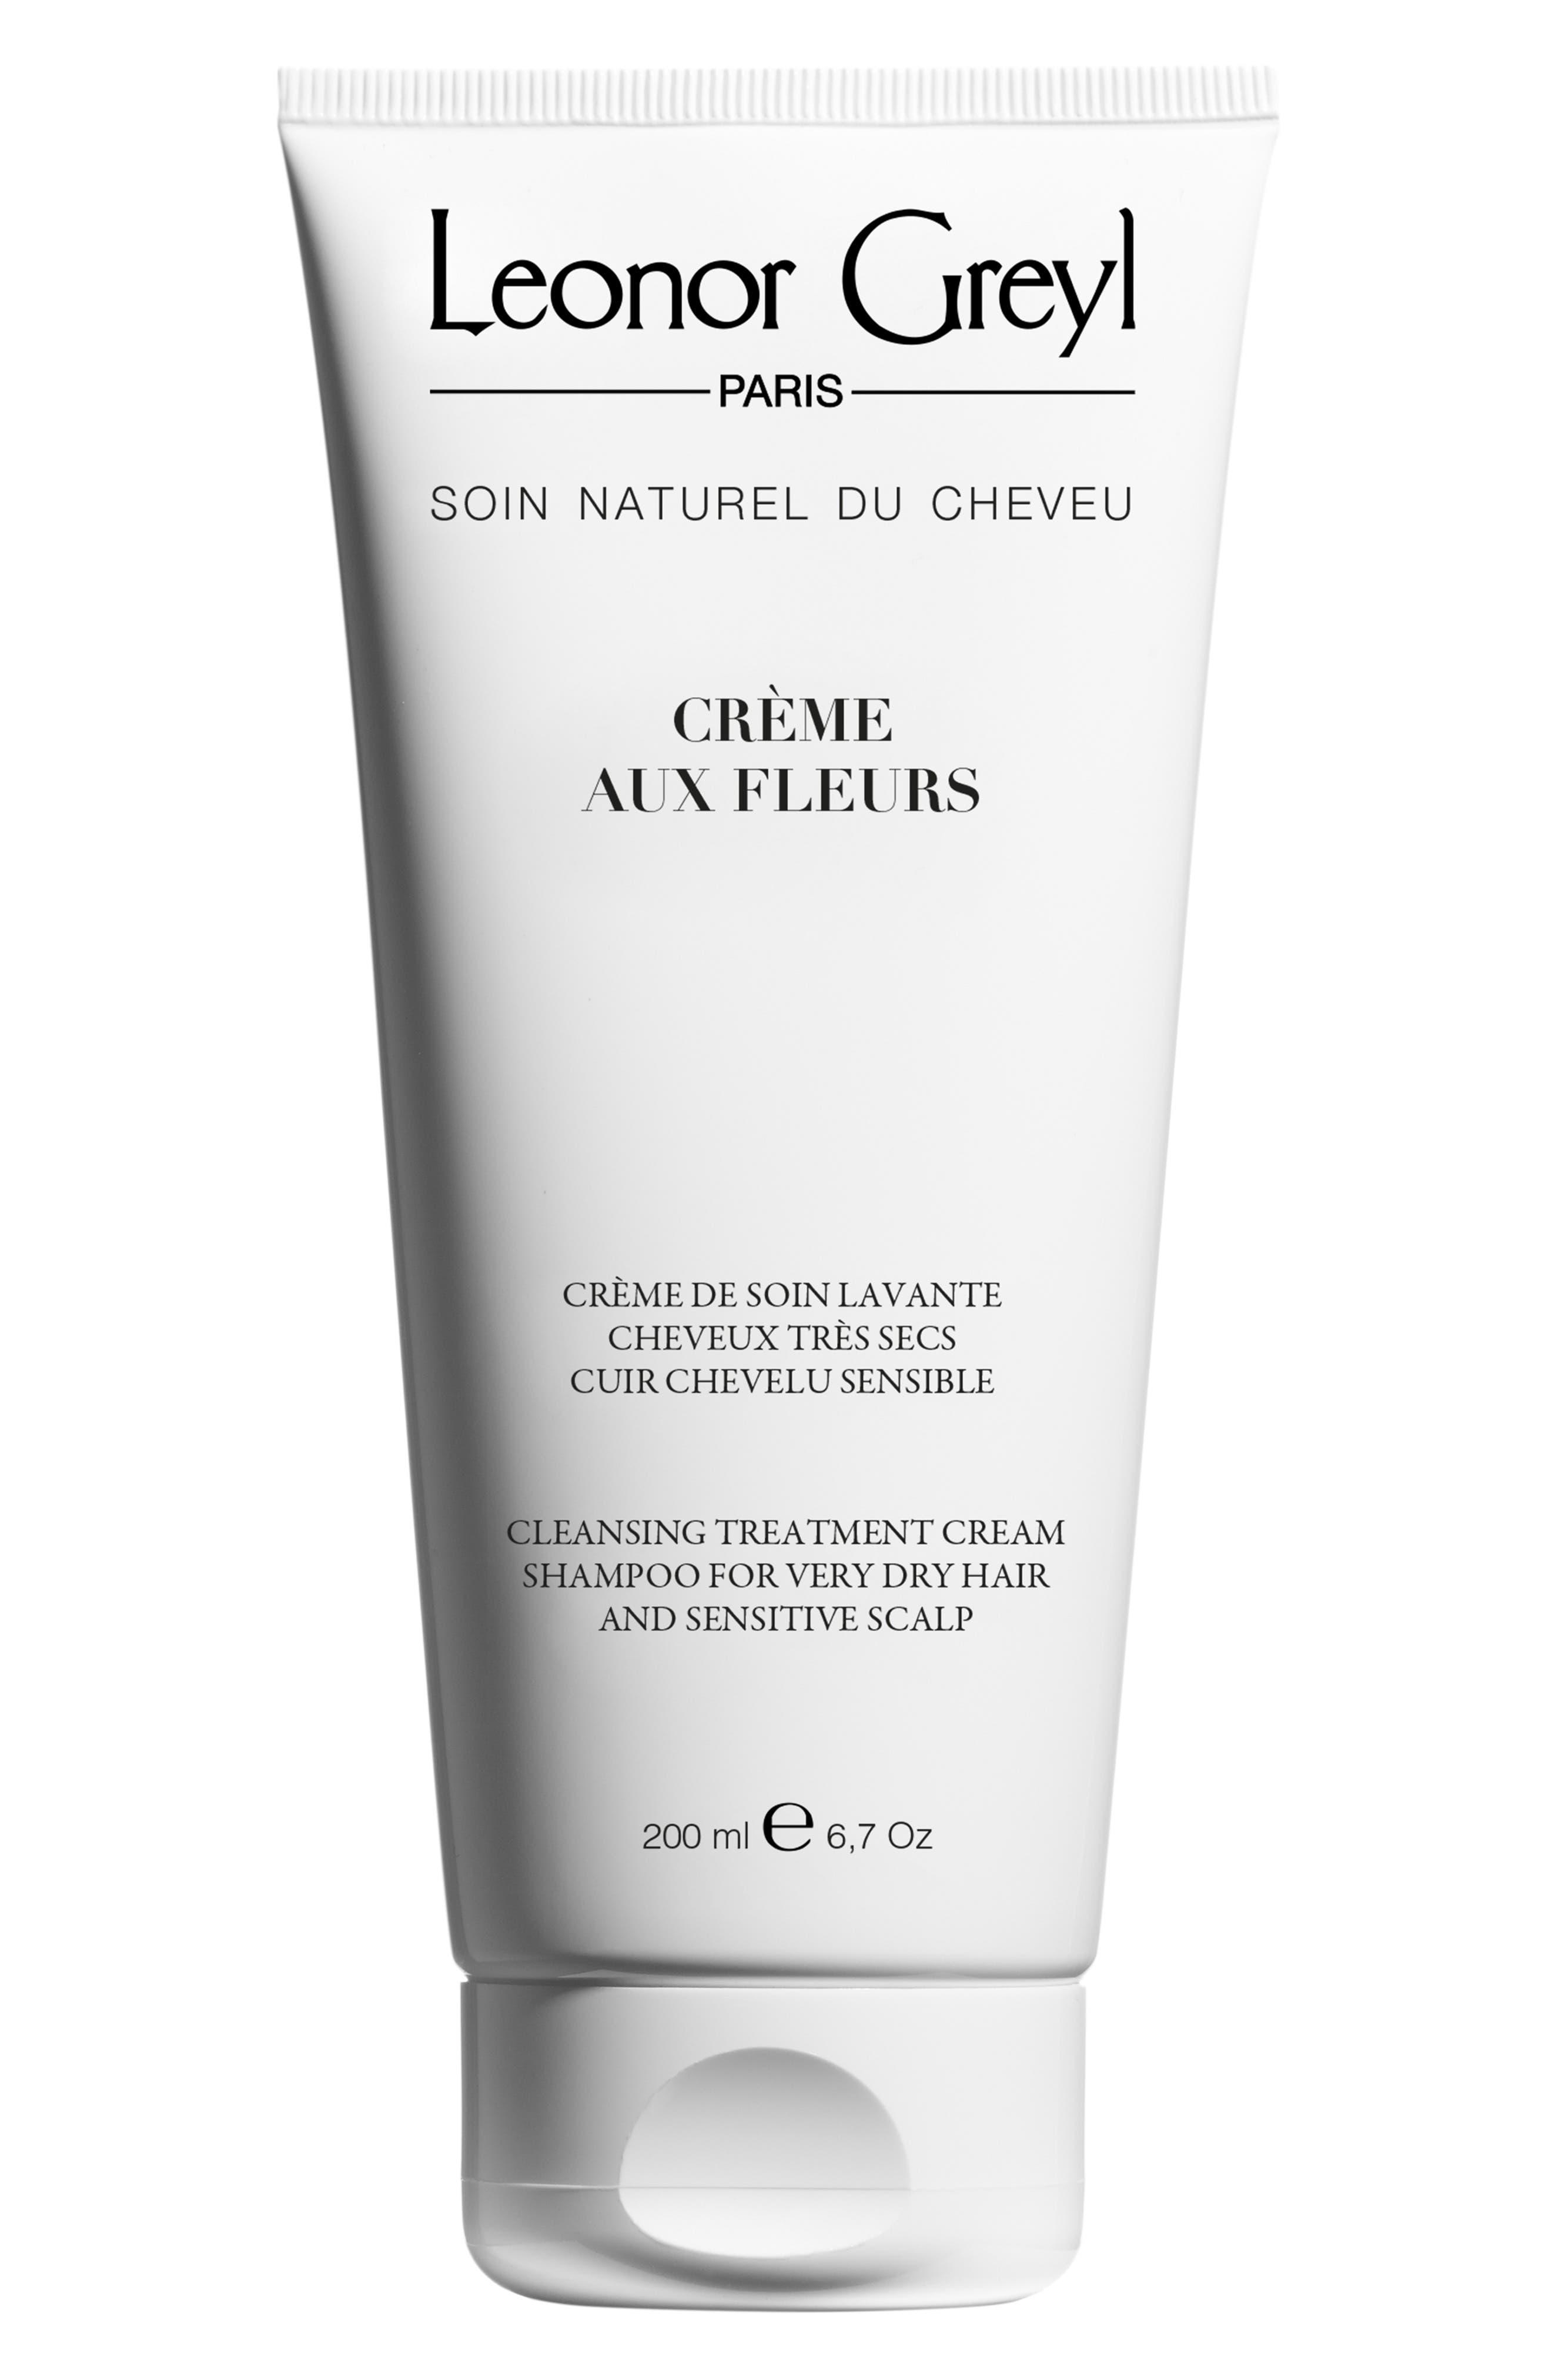 Creme Aux Fleurs Cream Shampoo